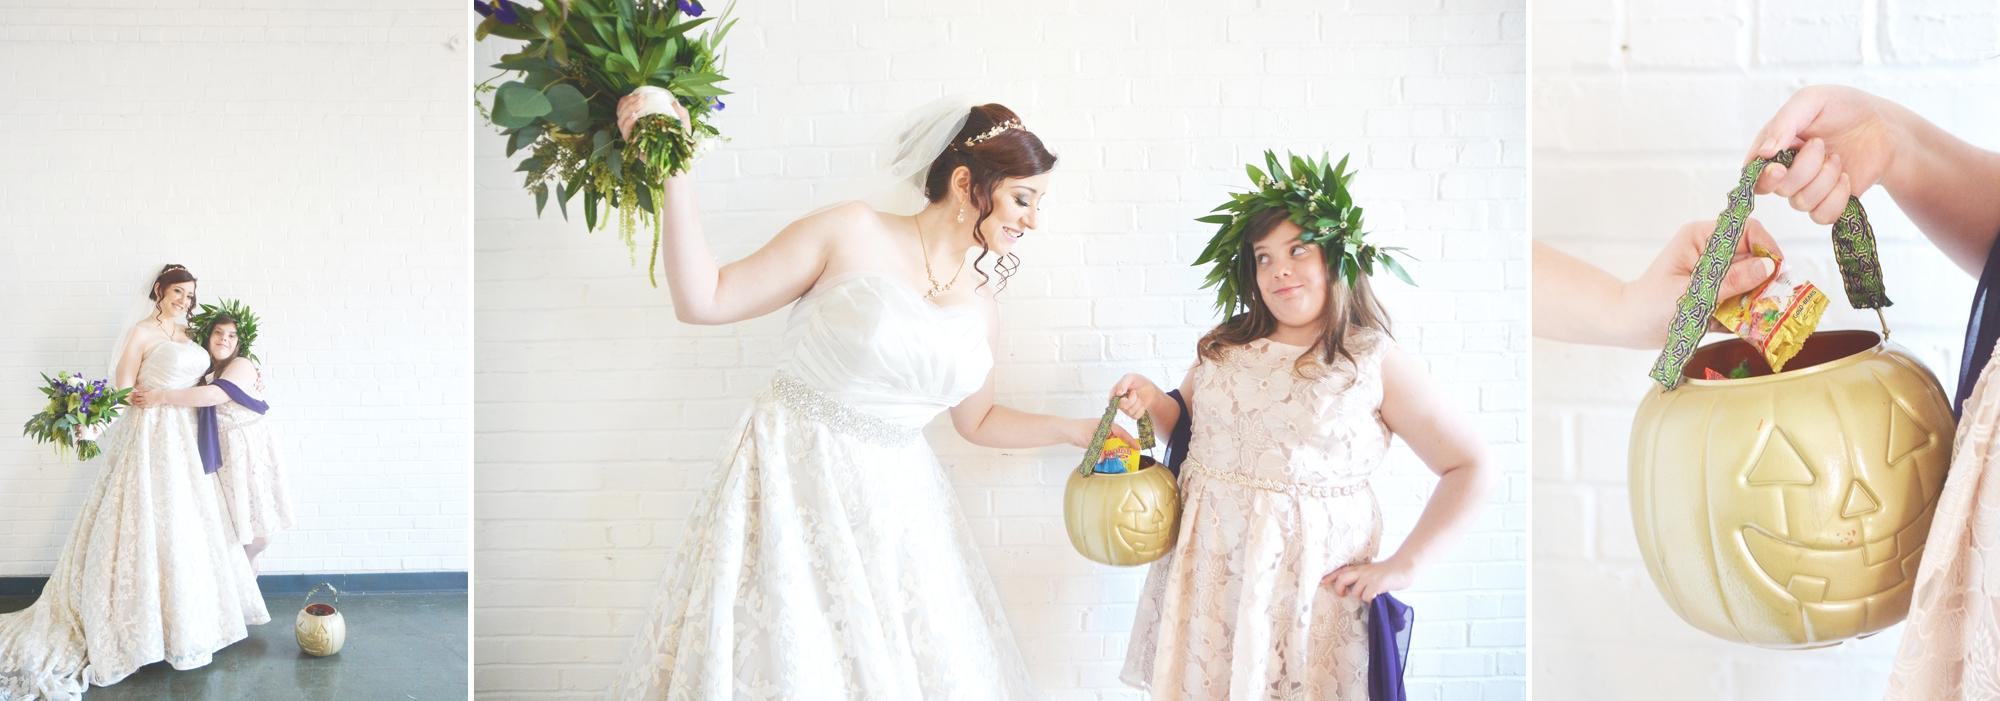 ambient-studio-wedding-photography-six-hearts-photography050